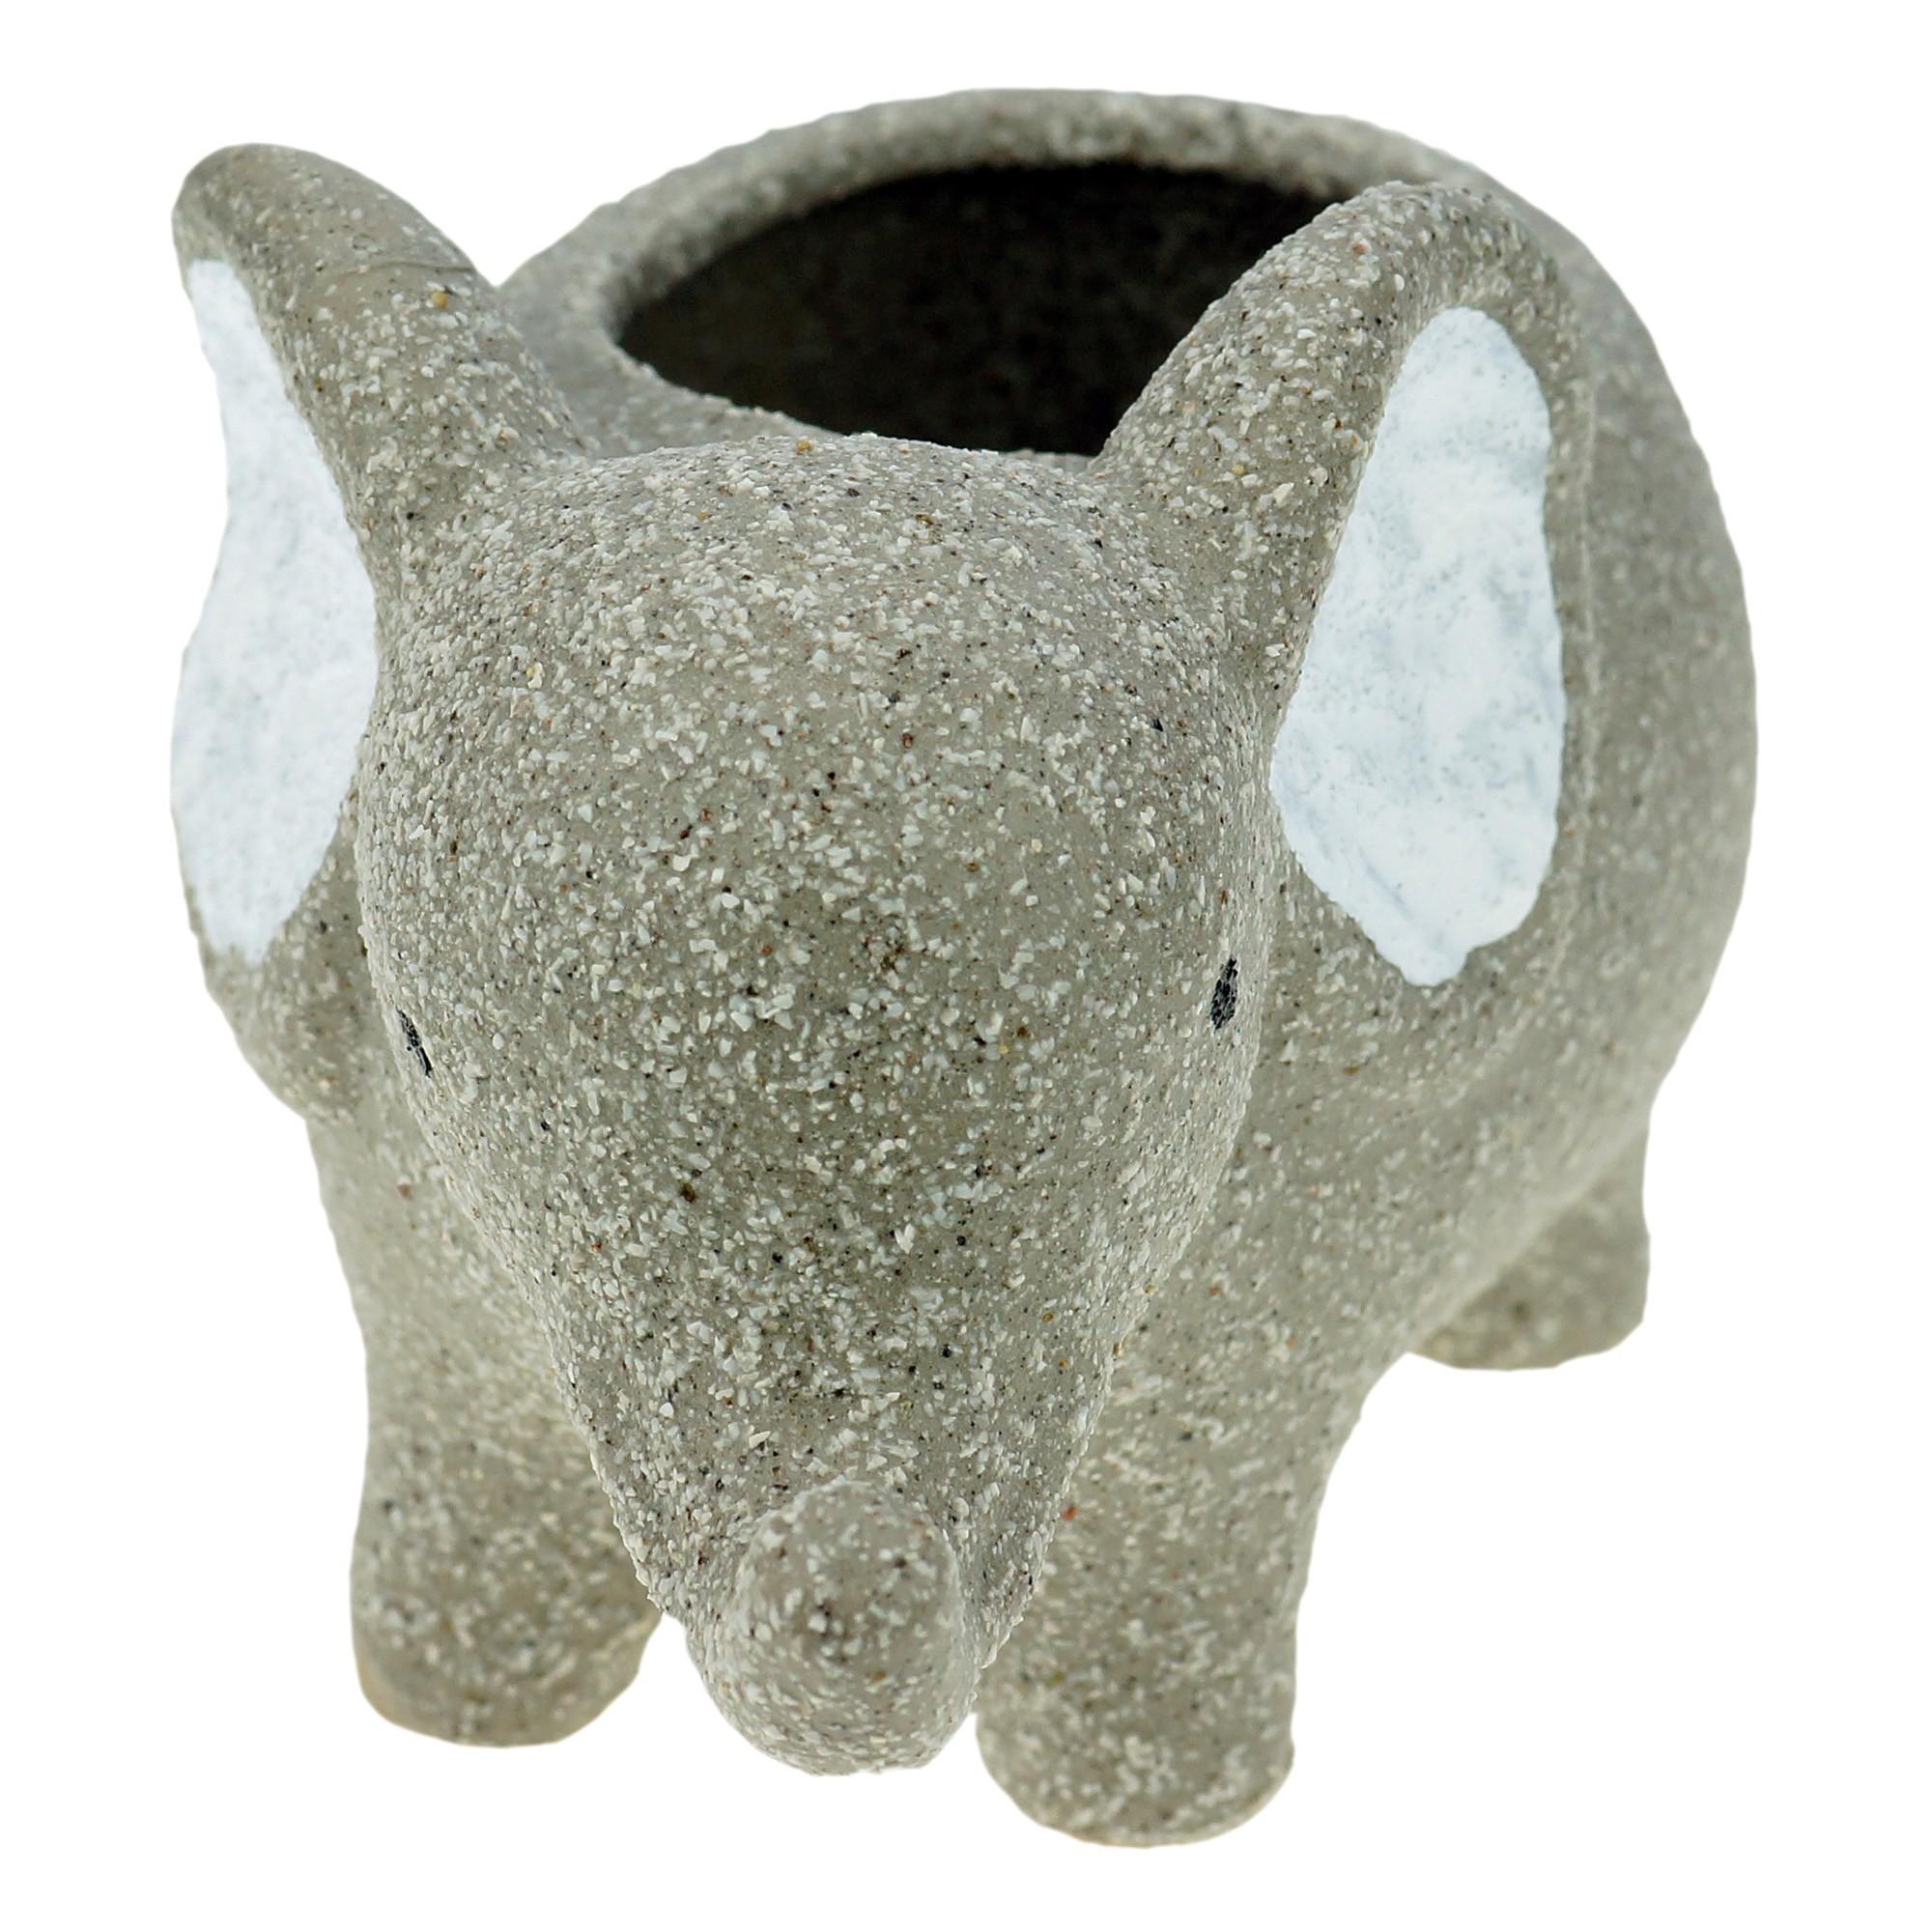 Cachepot Concreto Baby Elefante 9x8 cm Cinza - Urban